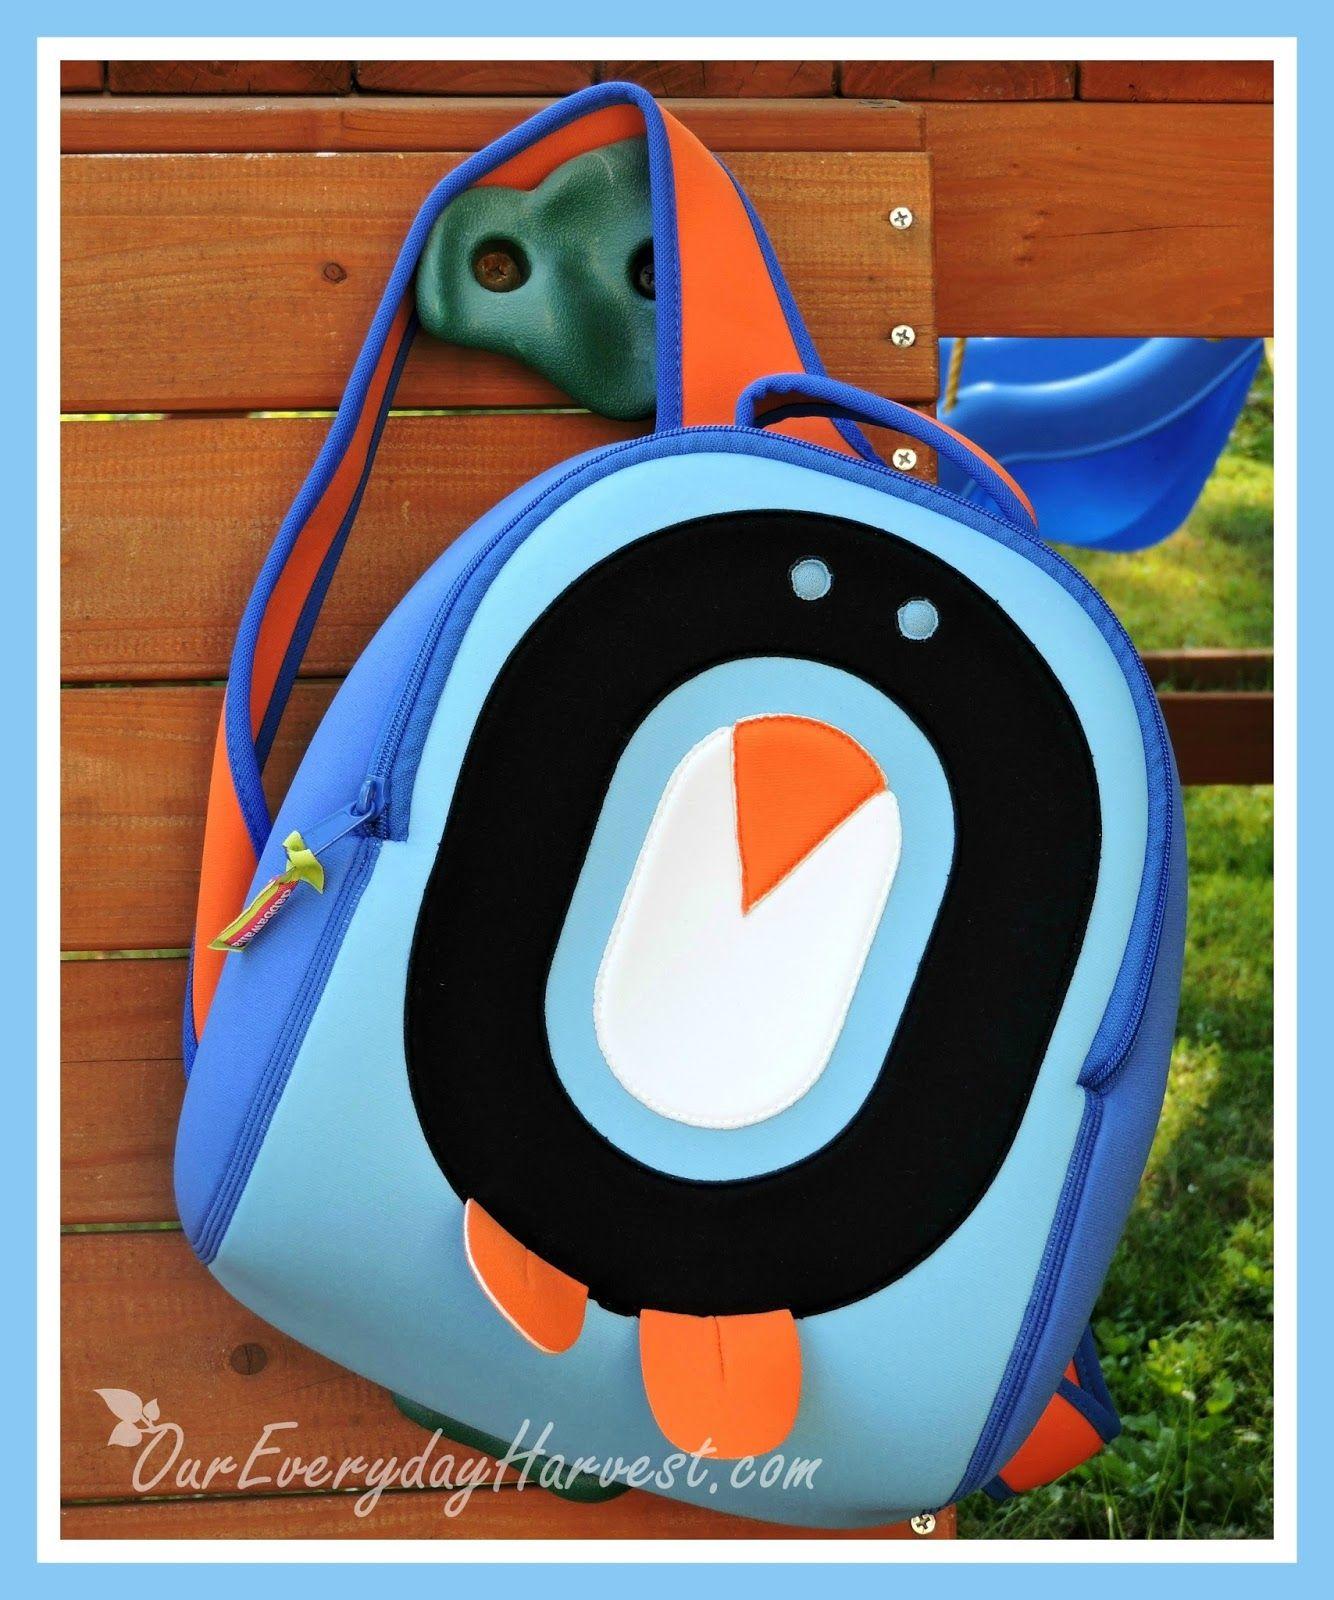 91127eb14042 Dabbawalla Bags  Fun and Adorable Backpacks for Preschoolers ...